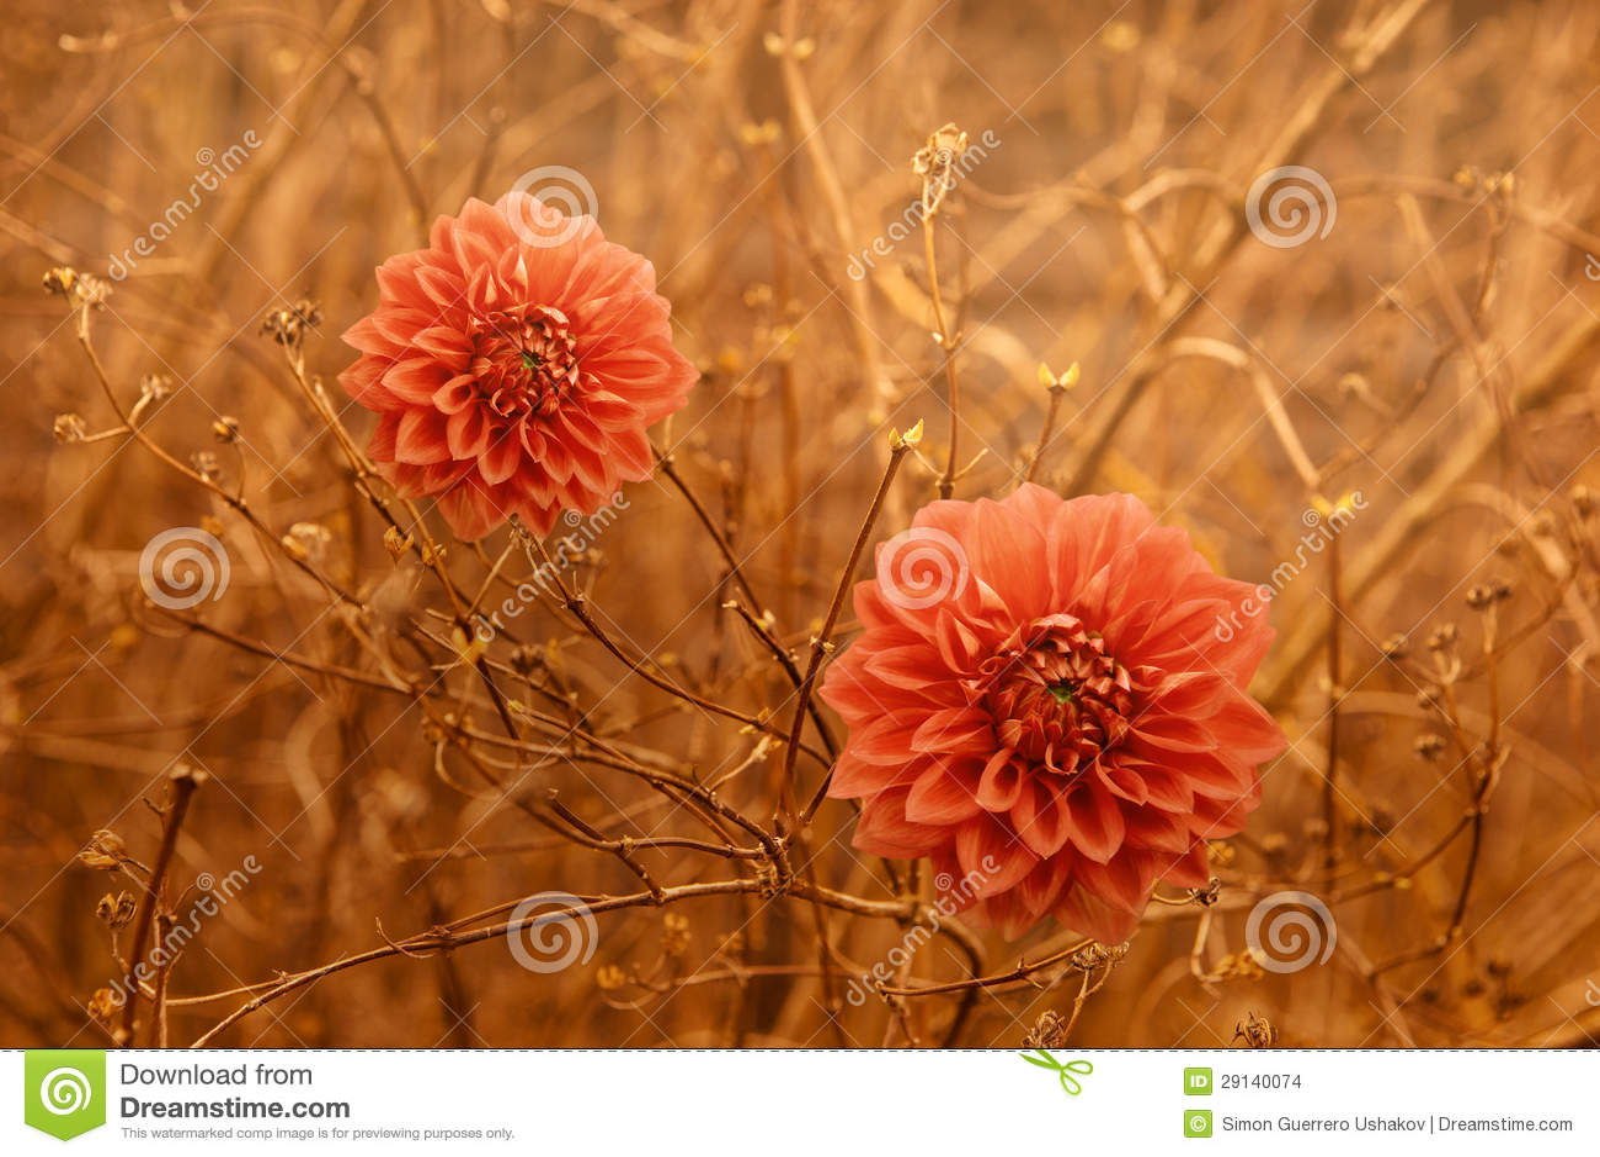 Fall Pumpkins Desktop Wallpaper Two Orange Dahlia Autumn Flowers Over Brown Branches